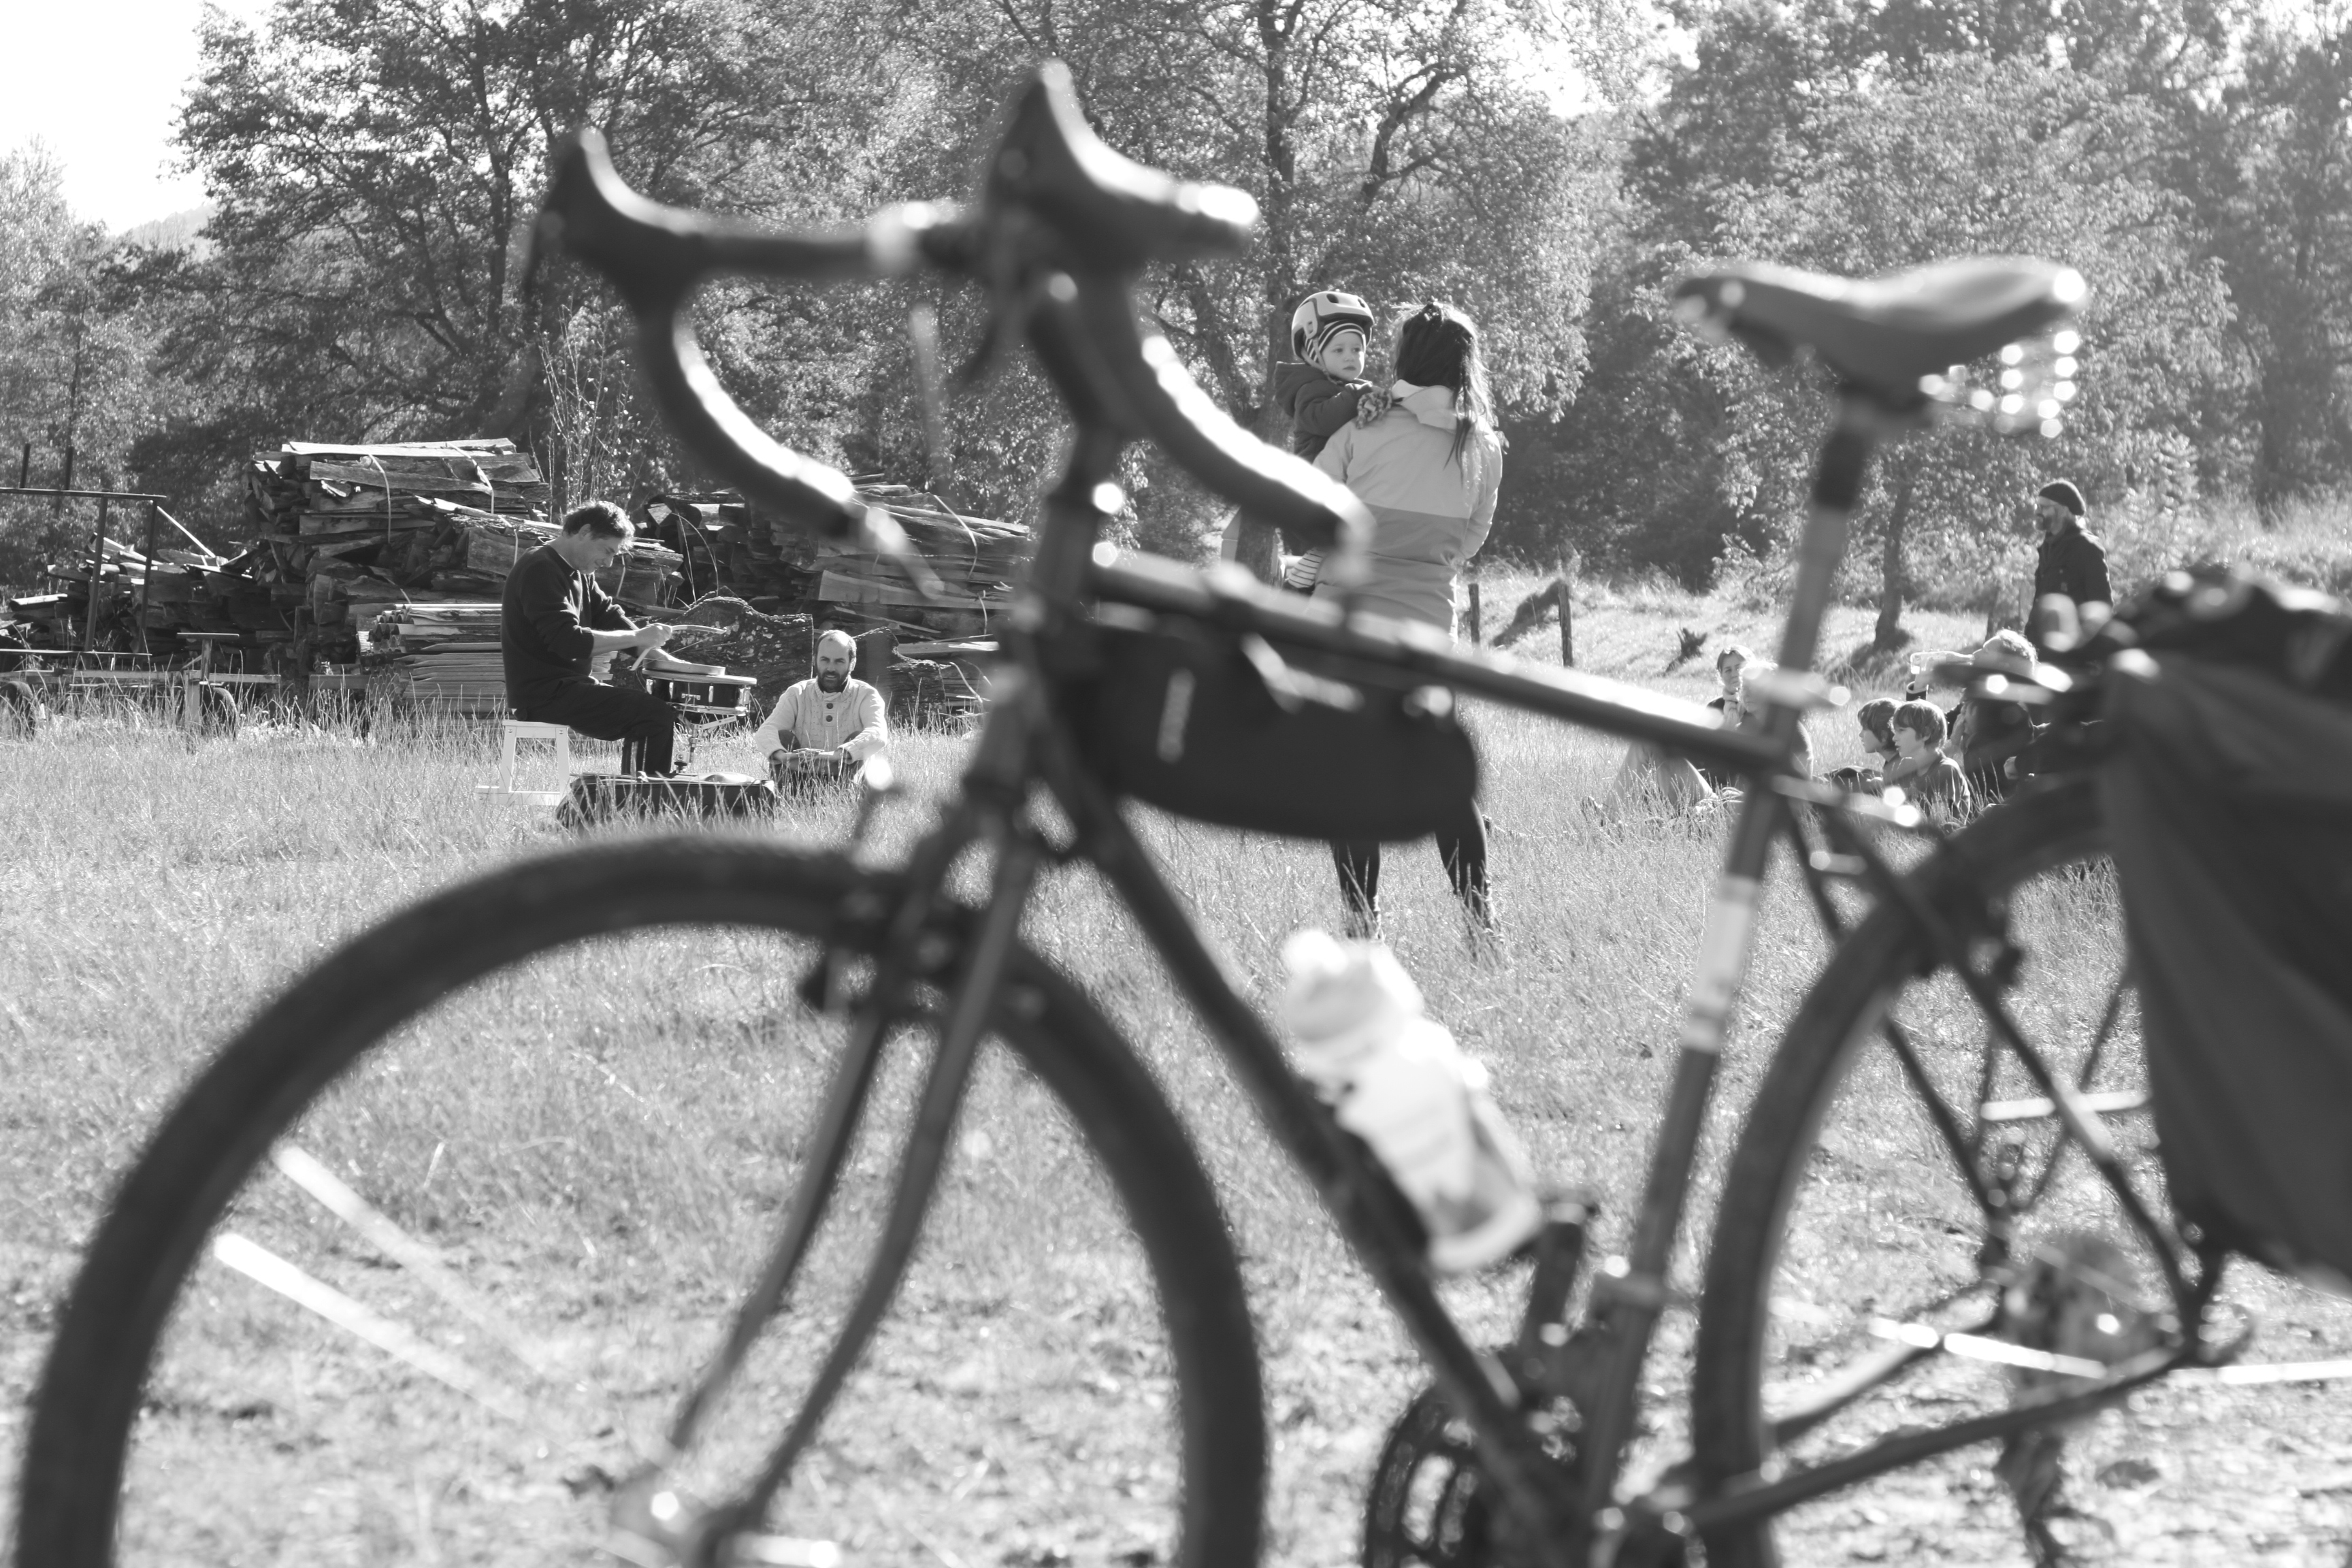 Balade à vélo (13)